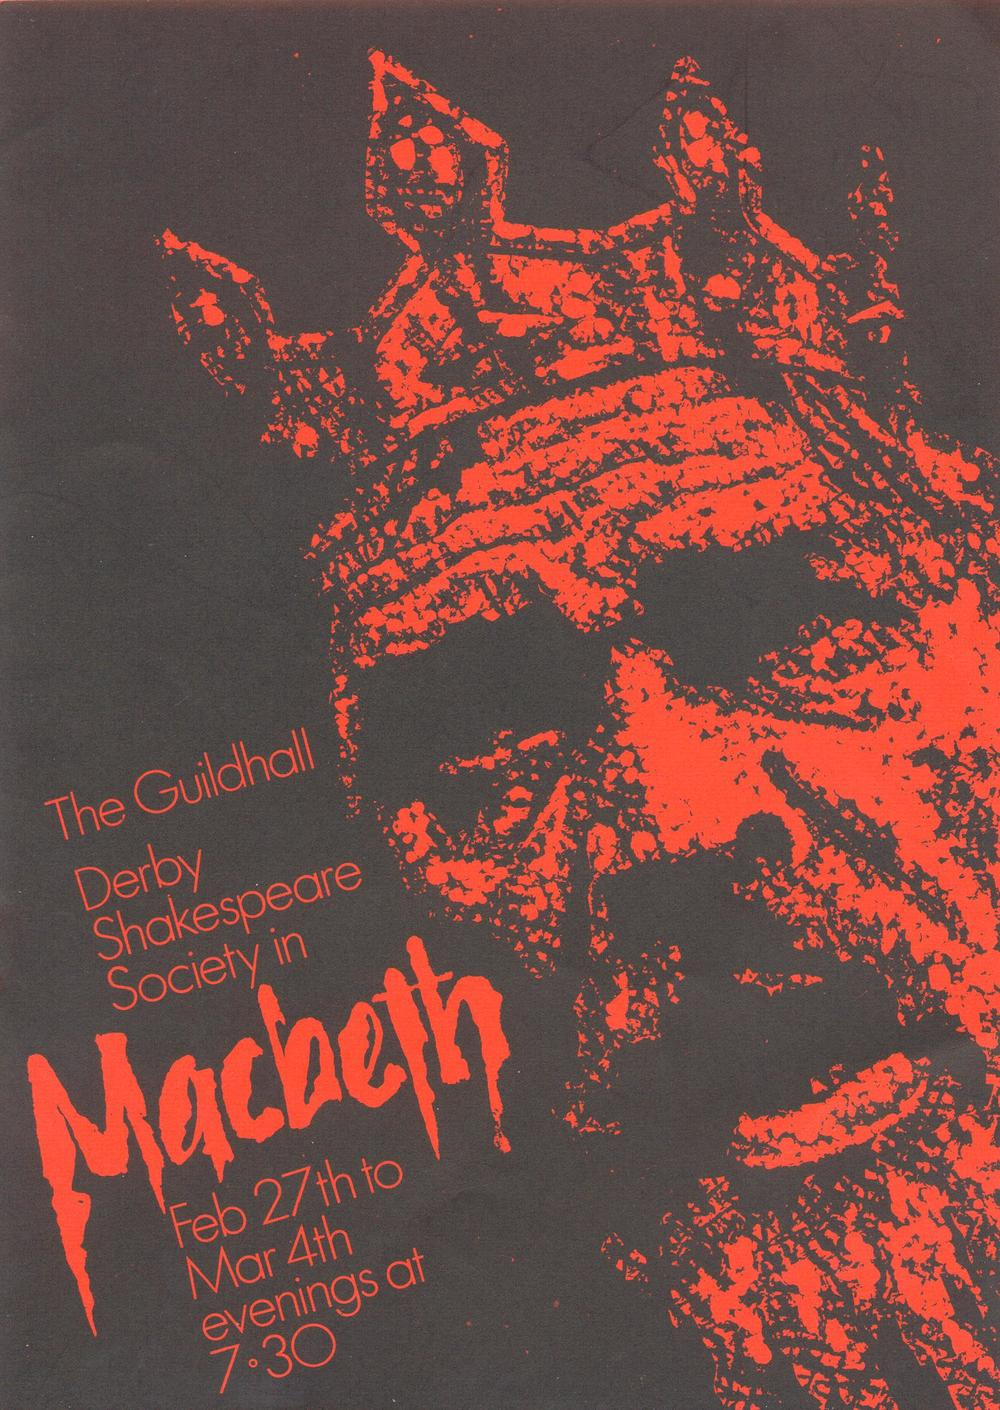 'Macbeth' 1978